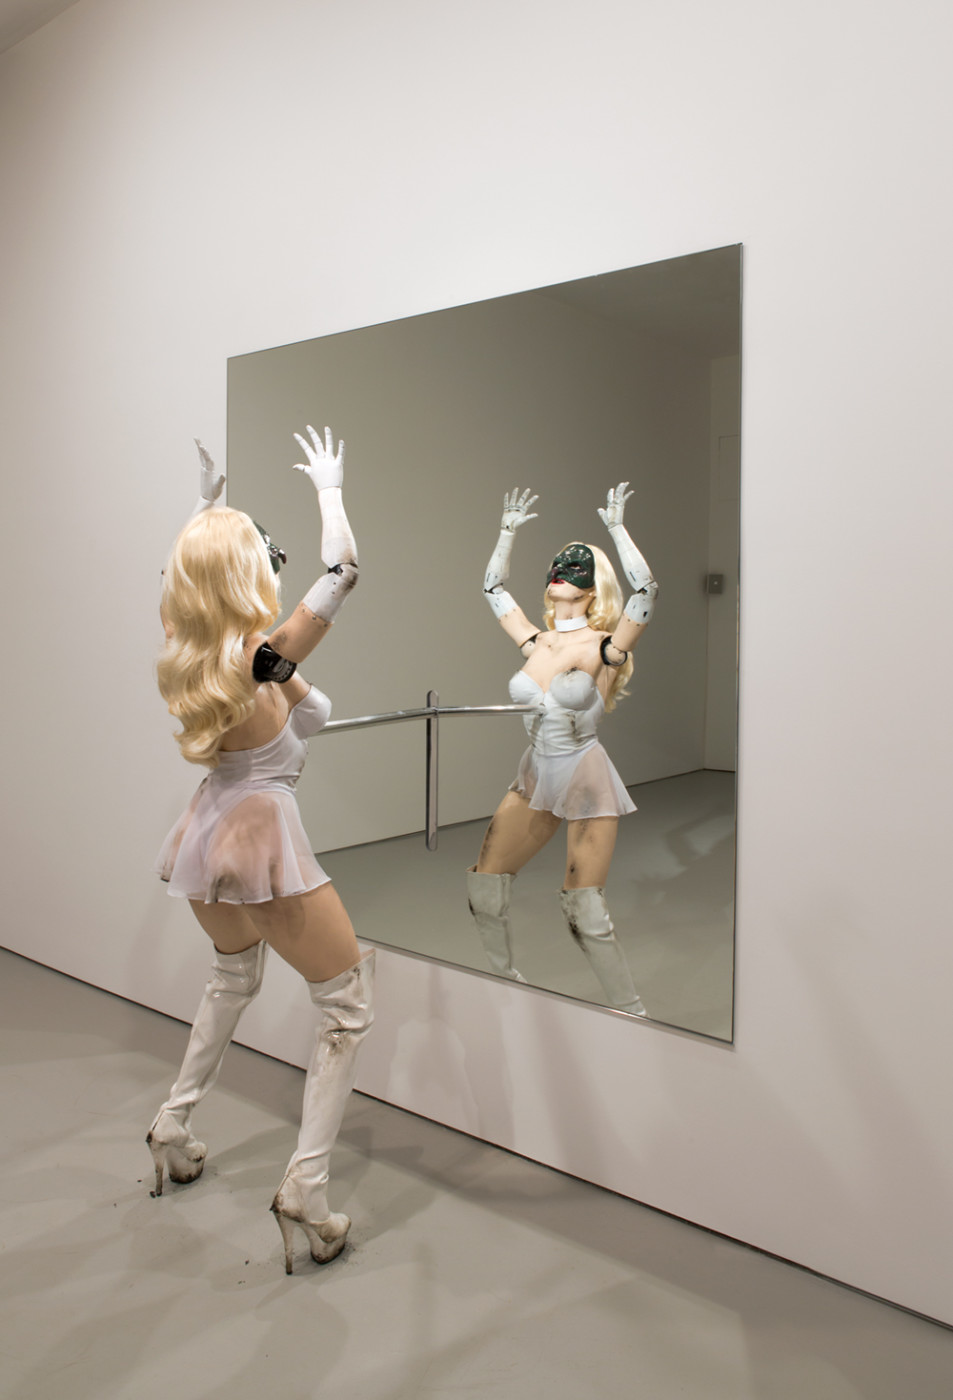 <p><em>Female figure</em>, 2014</p><p>Mixed media</p><p>Overall: 90 1/2 x 72 x 29 inches 229.9 x 182.9 x 73.7 cm</p><p>Height of sculpture ranges from 55 to 73 inches /139.7 to 185.4 cm</p><p>Length of sculpture ranges from 24 1/2 to 48 inches / 62.2 to 121.9 cm</p><p>Depth of sculpture ranges from 29 to 39 inches / 73.7 to 99.1 cm</p><p>Mirror: 72 x 72 inches / 182.9 x 182.9 cm</p>